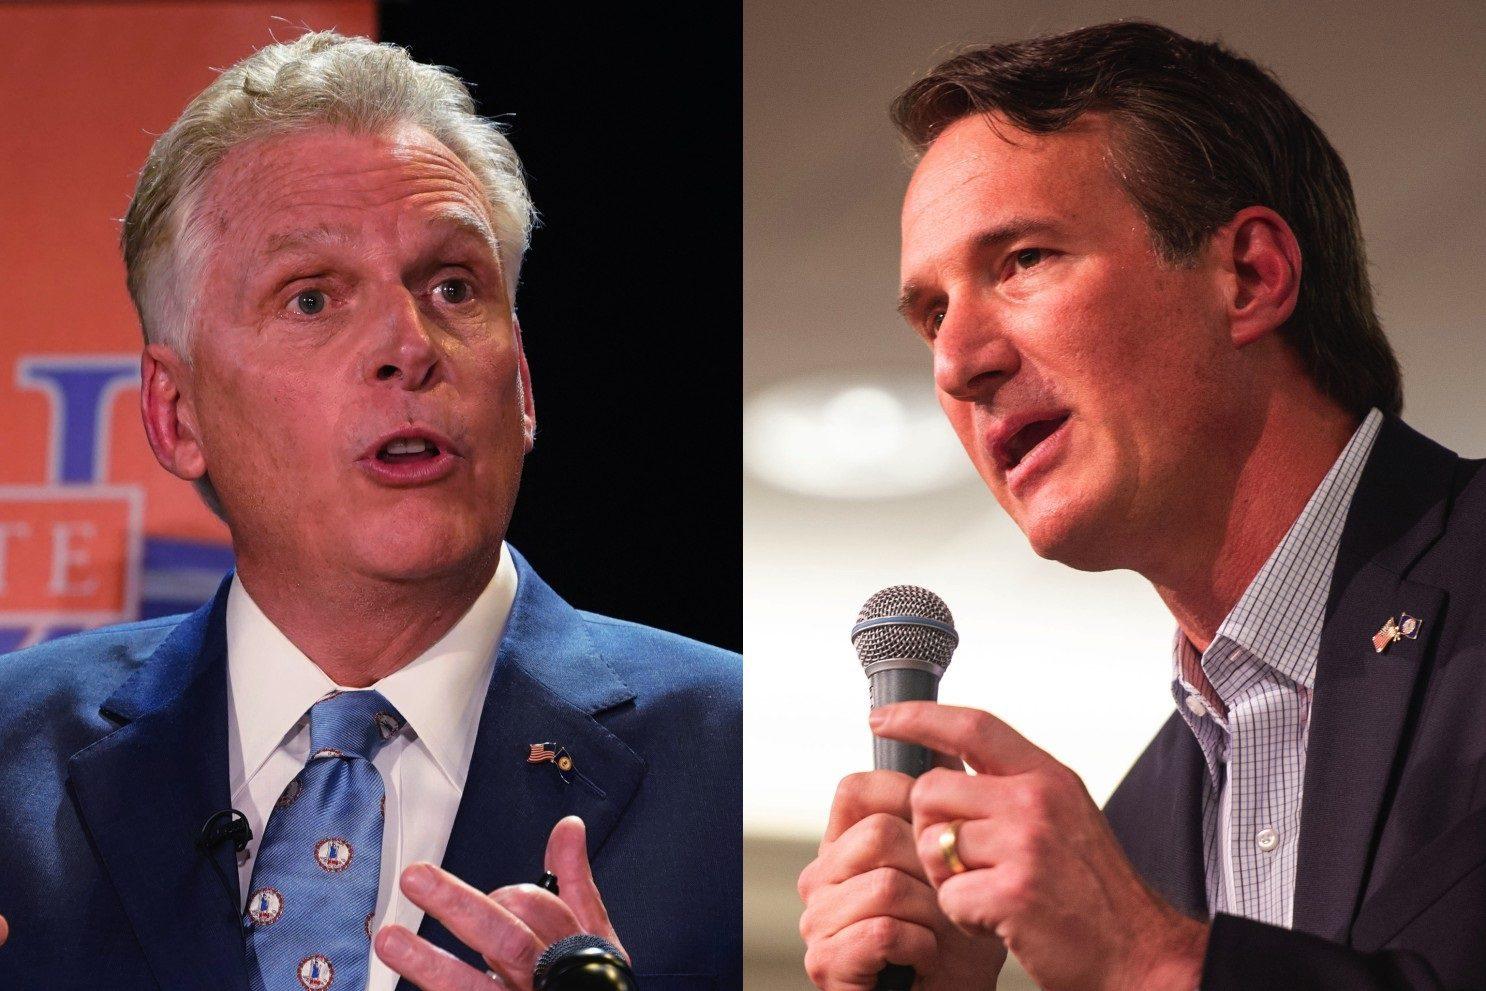 2021 Virginia Governor Election Opinion Polls: Youngkin fails to get NRA endorsement